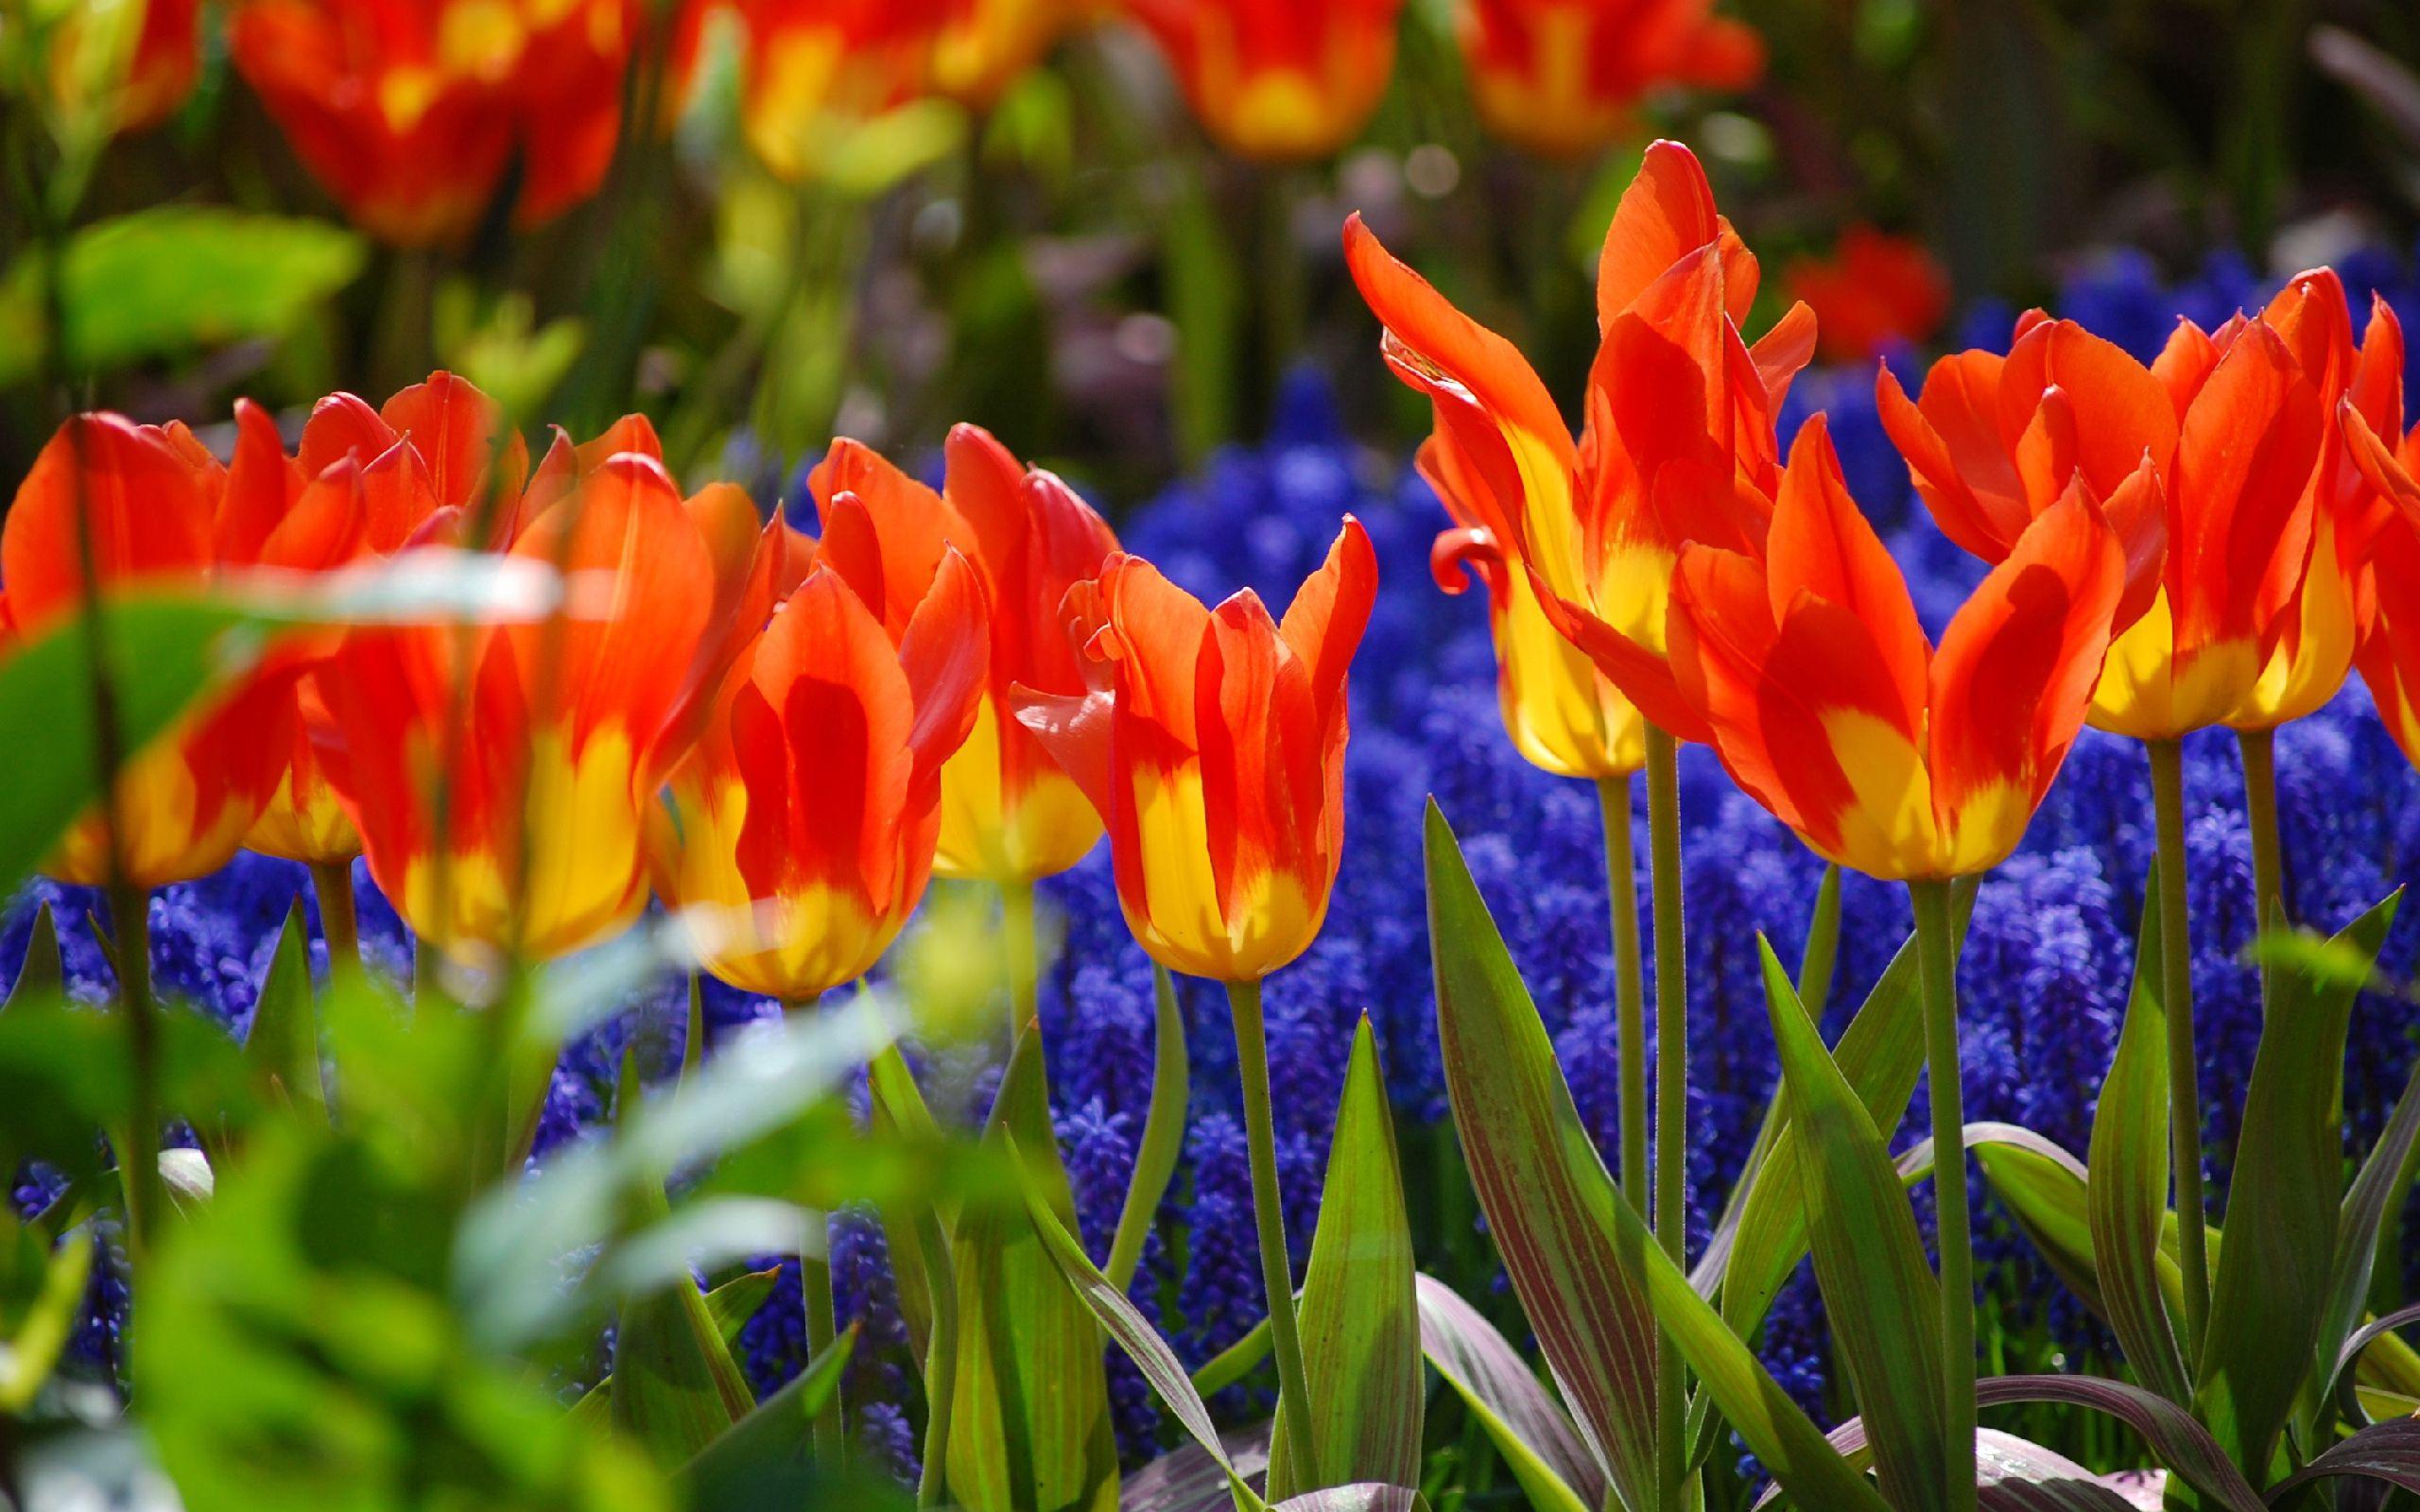 81070 descargar fondo de pantalla Flores, Planta, Pétalos, Tulipanes: protectores de pantalla e imágenes gratis